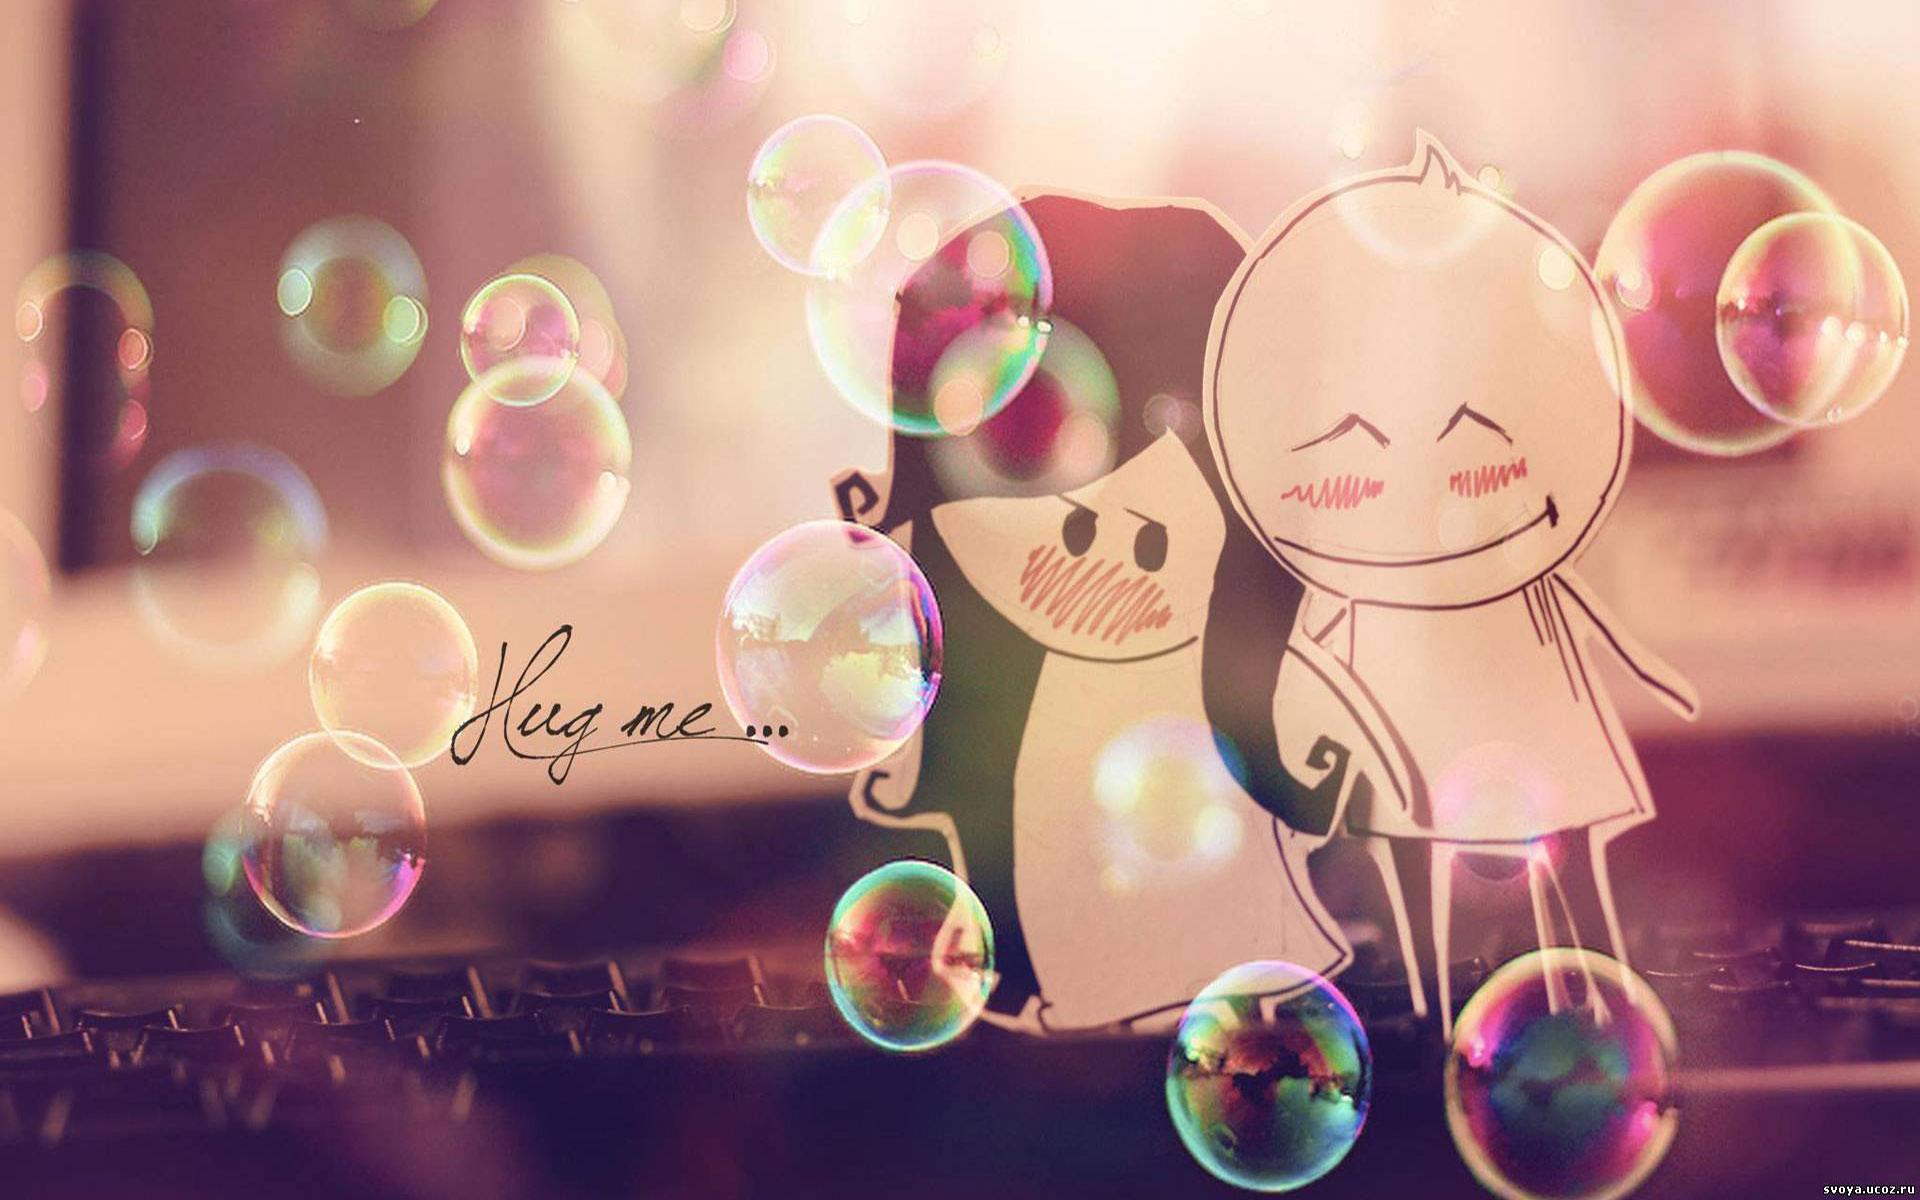 Cute and Beautiful Love Wallpaper Free Download HD